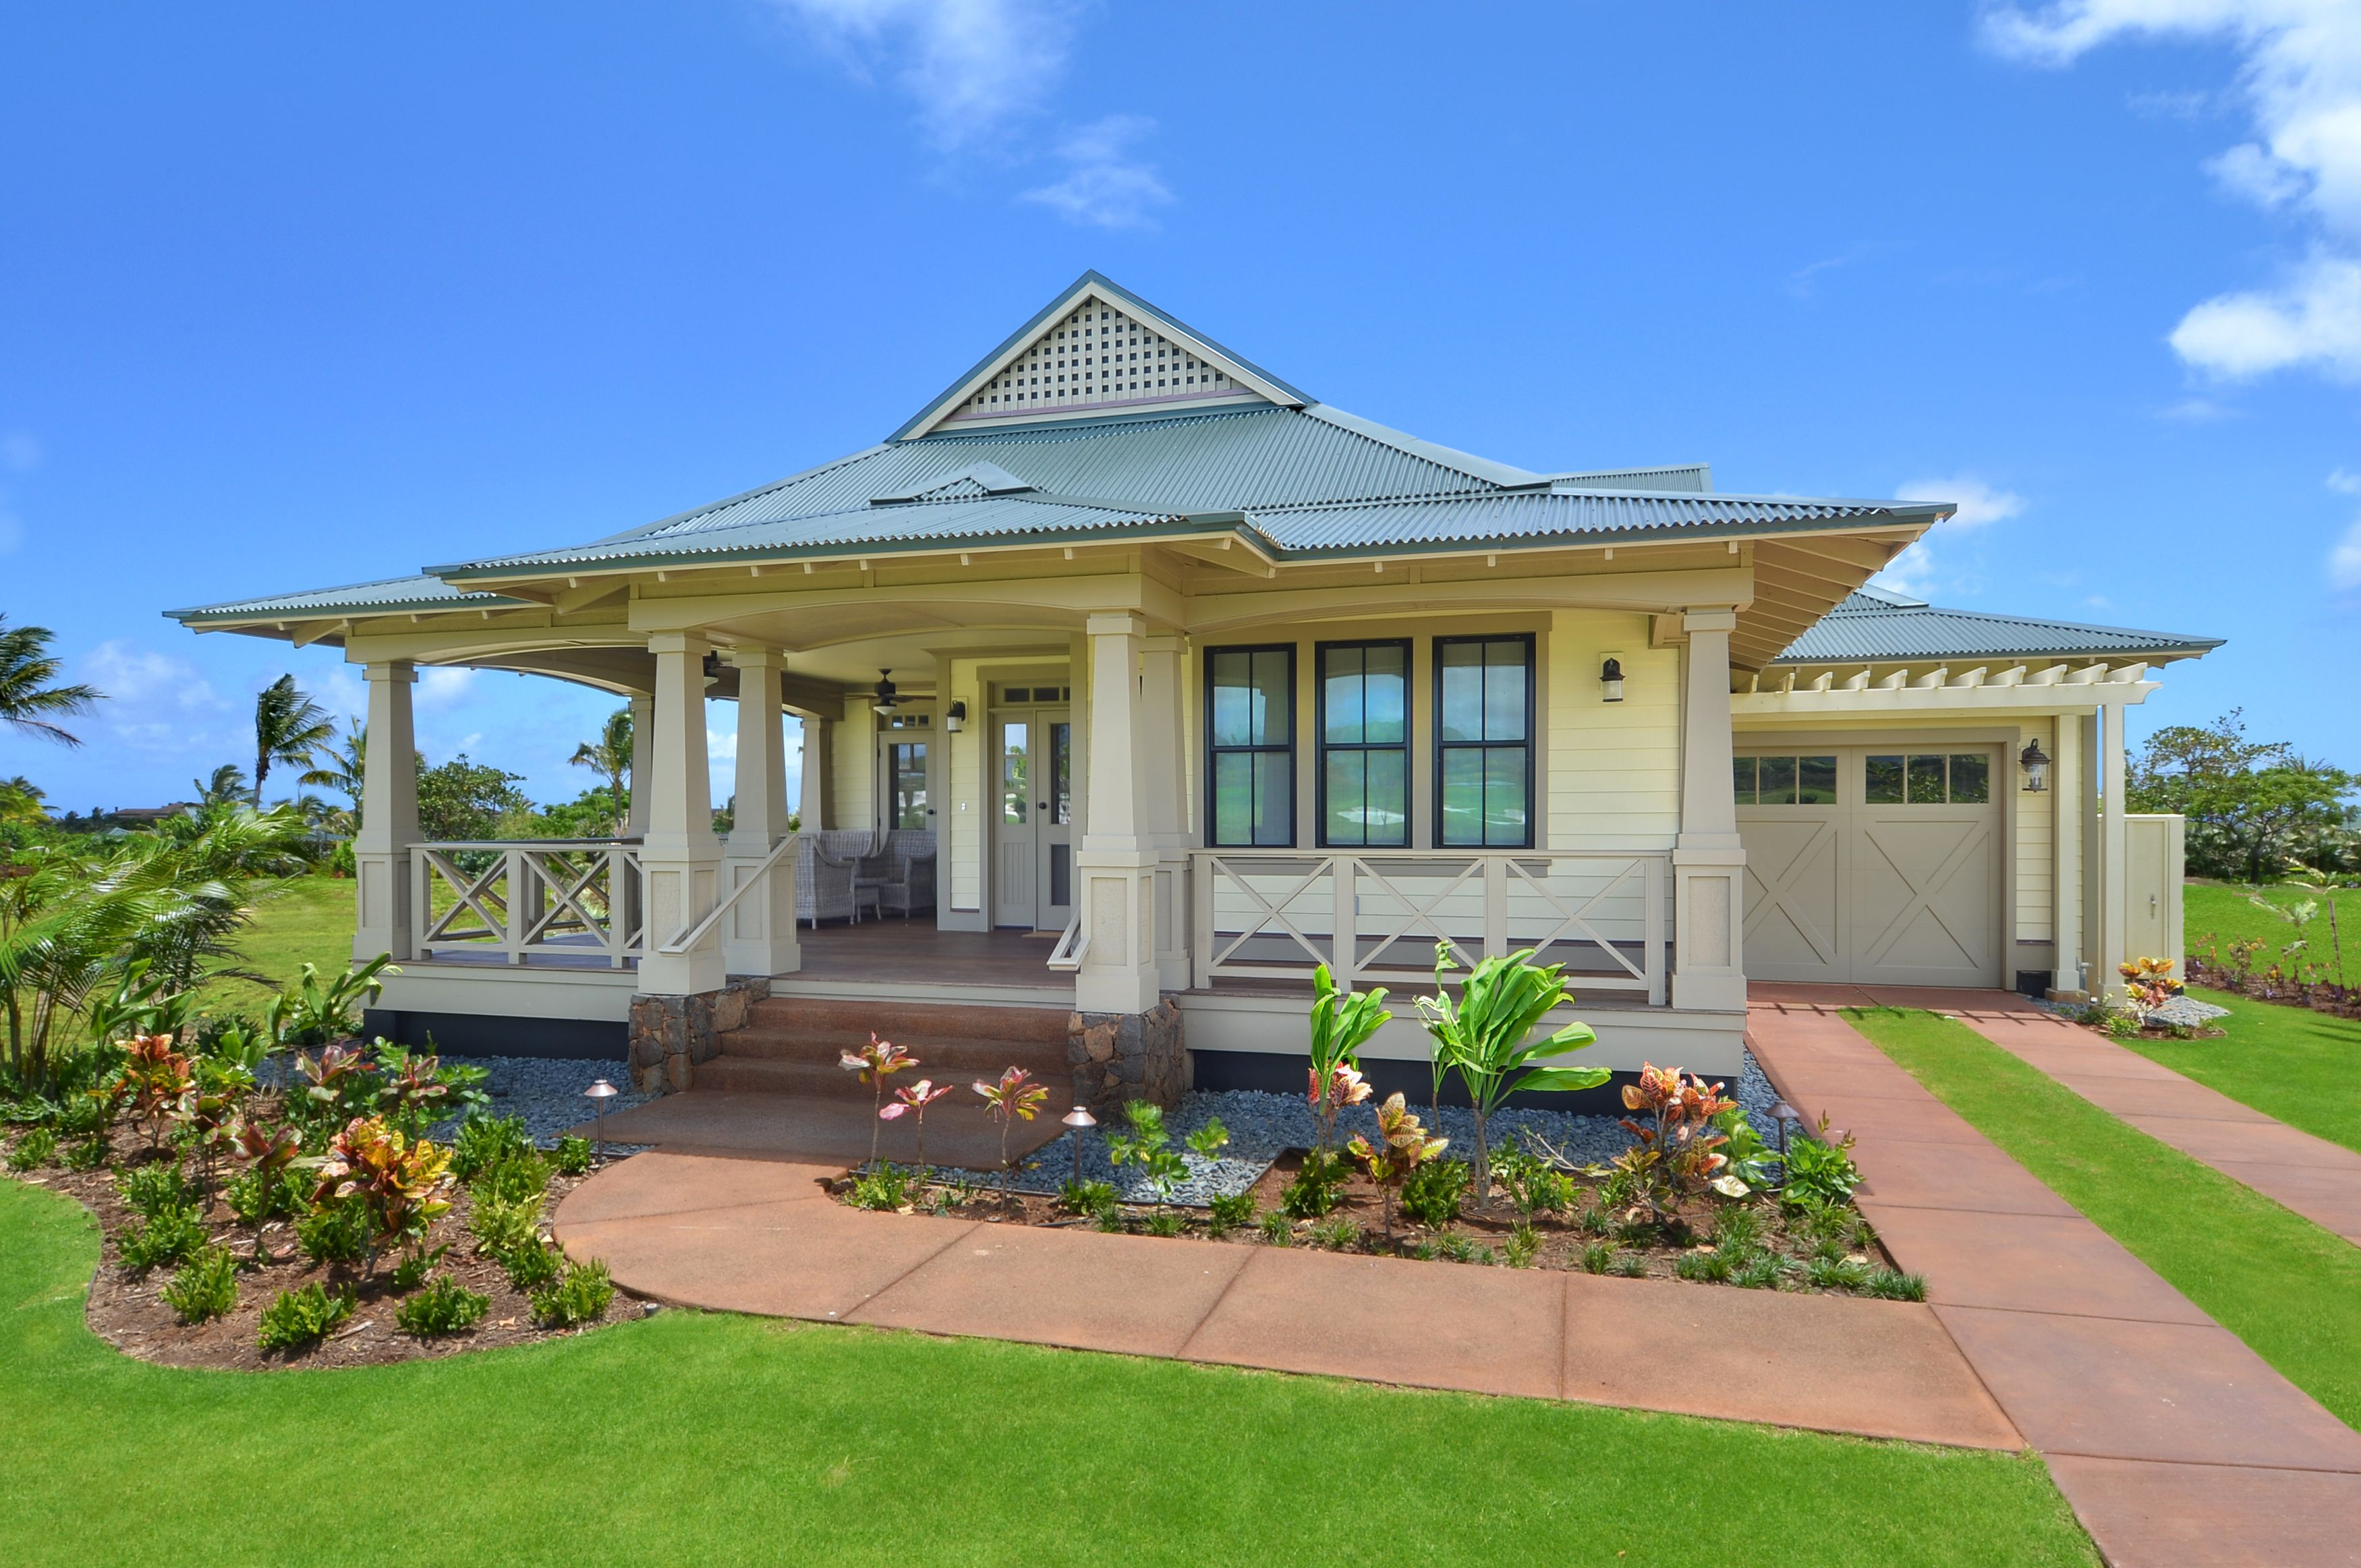 Hawaiian style home designs